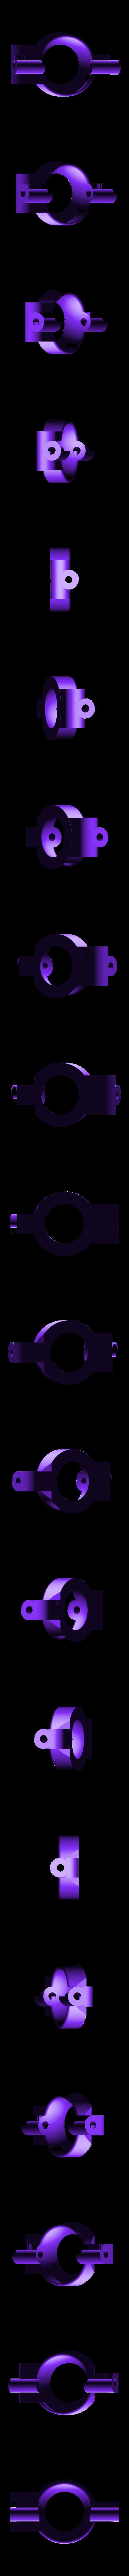 MRCC_OBTS_SUS_CHUB_ONROAD.stl Download STL file MyRCCar 1/10 On-Road Build for Tesla Model S Body RC Car • 3D print object, dlb5